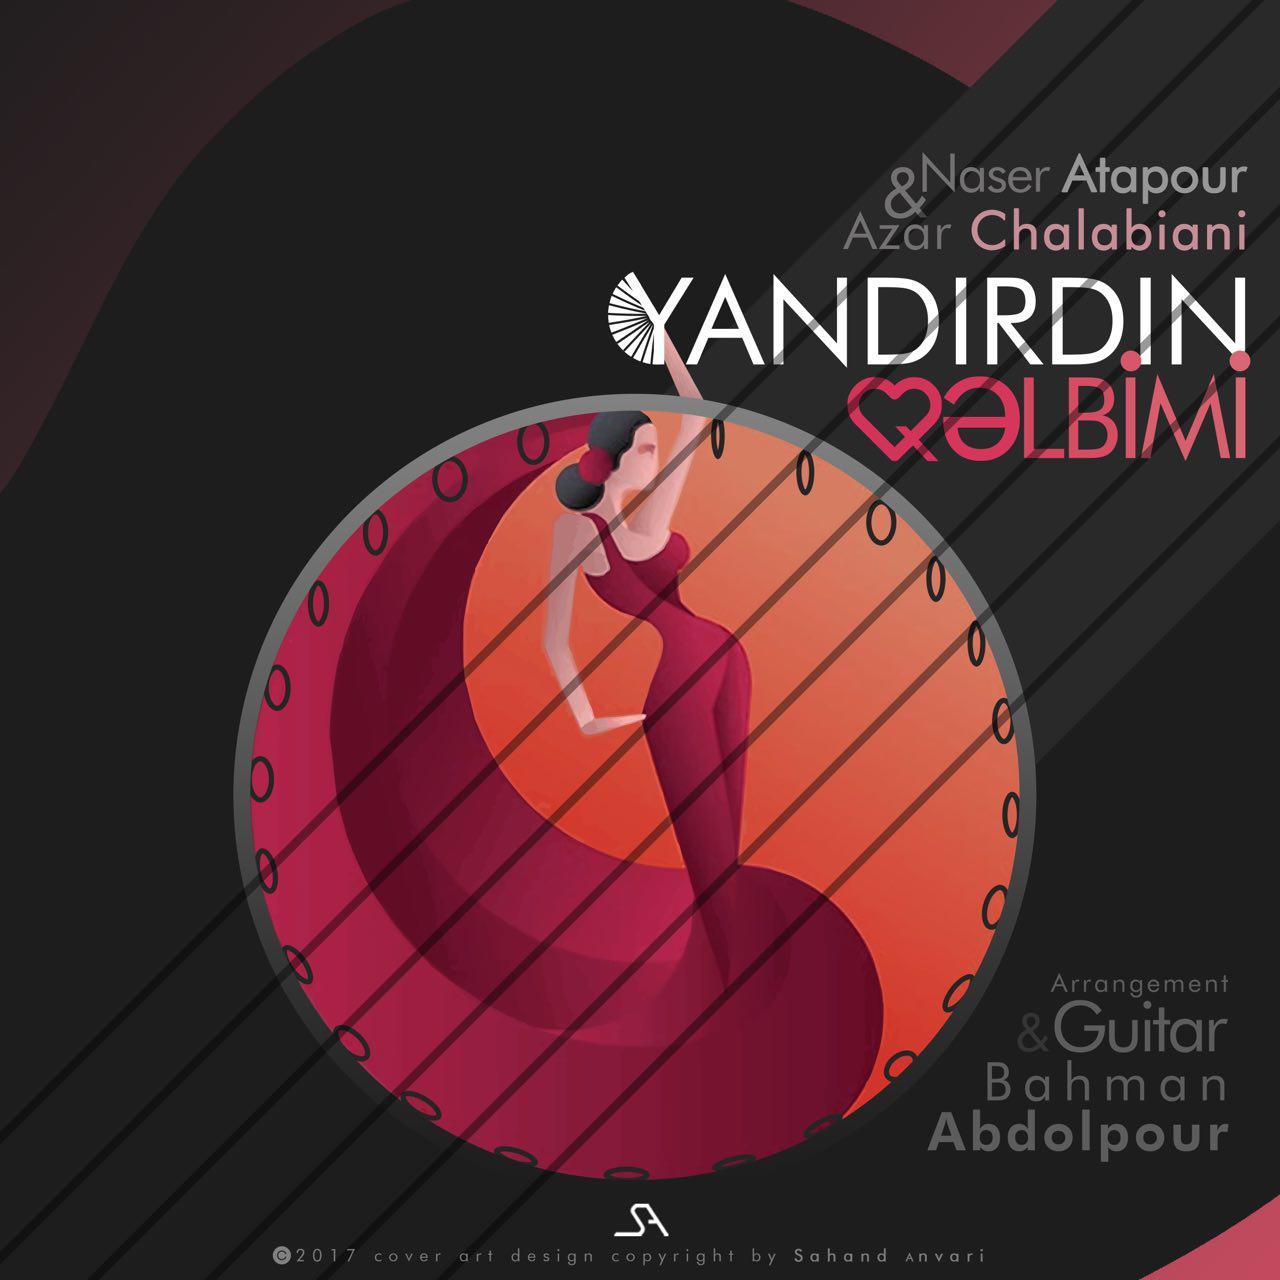 http://s9.picofile.com/file/8322415442/32Naser_Atapour_Azar_Chalabiani_Yandirdin_Qalbimi.jpg